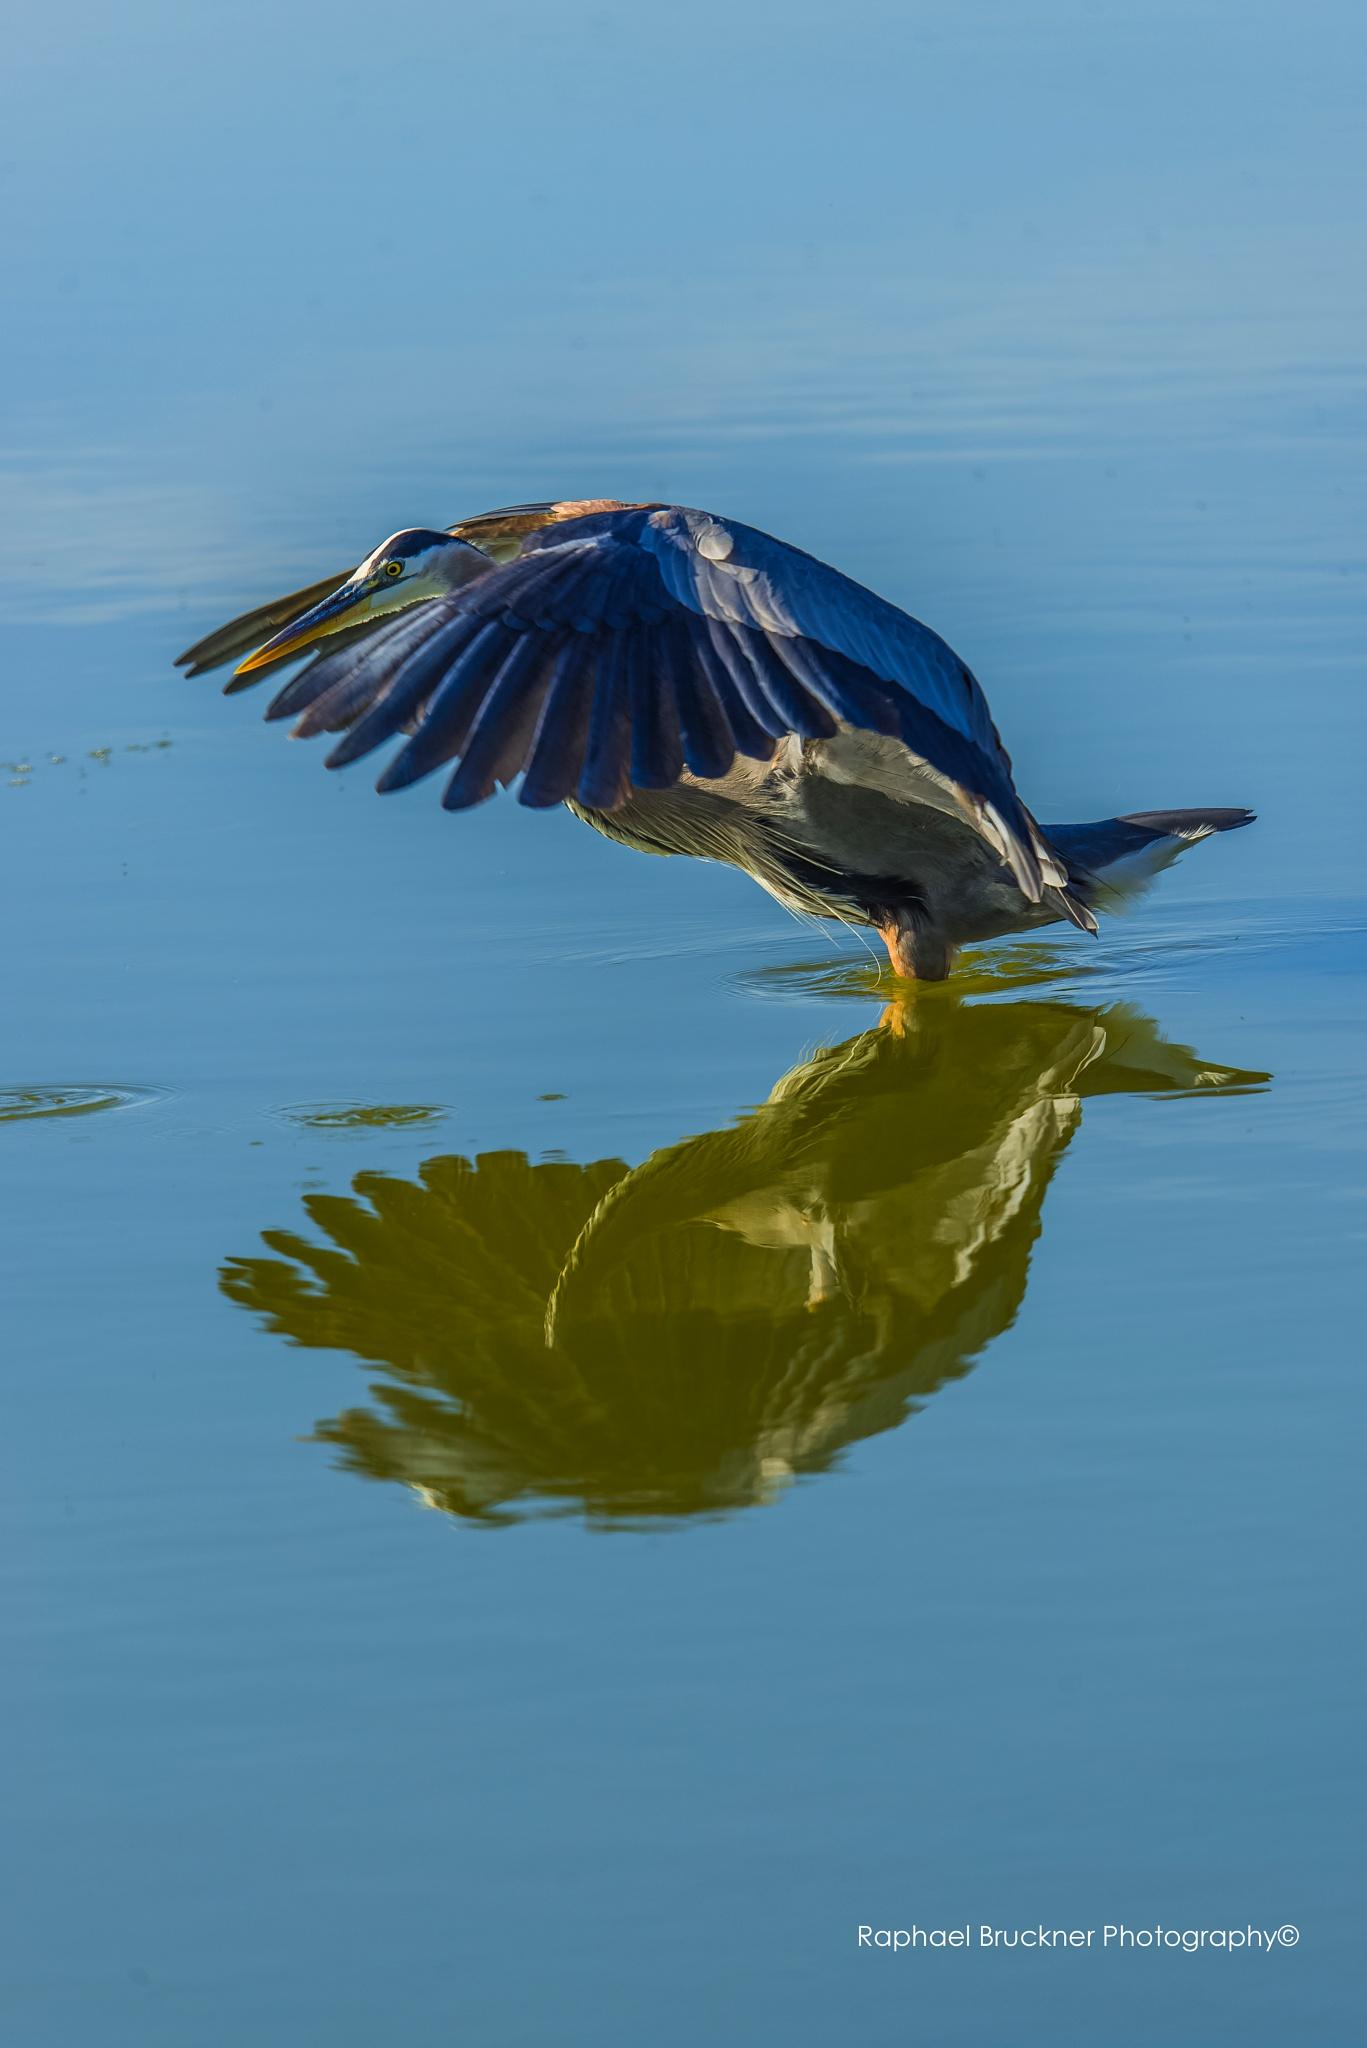 The Blue Egret Dance by Raphael Bruckner Photography